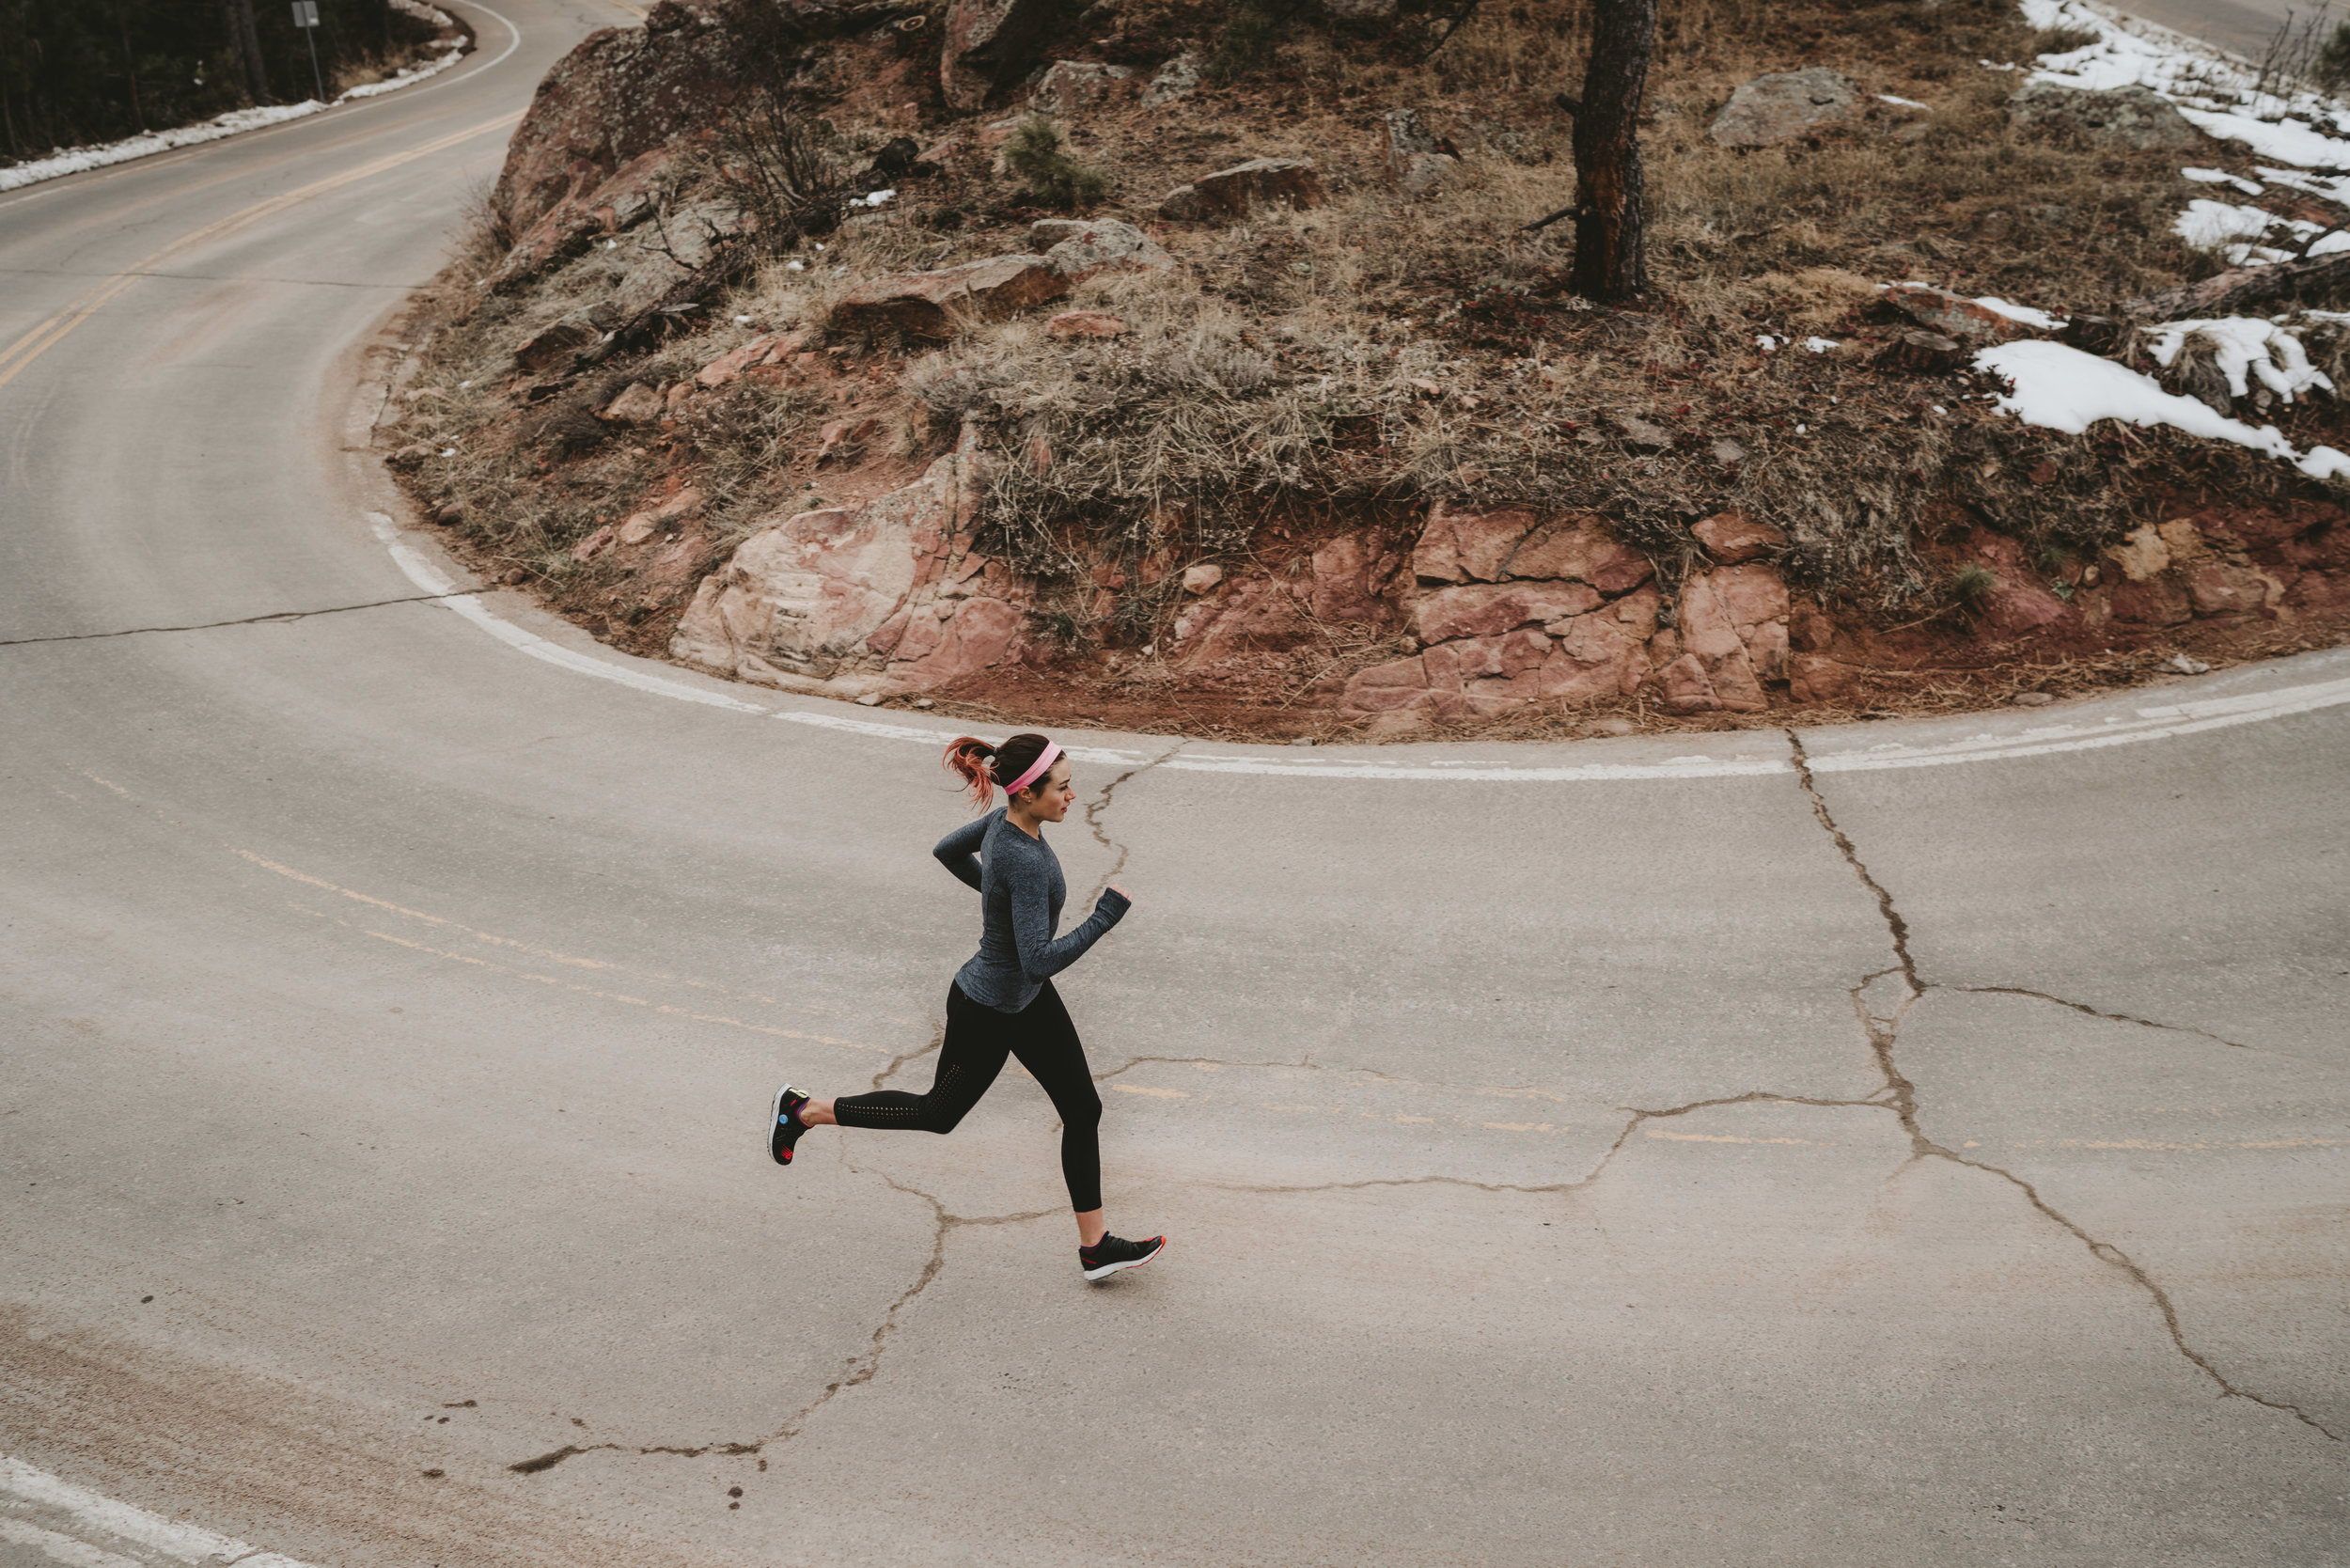 fitness-photographer-tim-gillies-photography-DSC07038.jpg